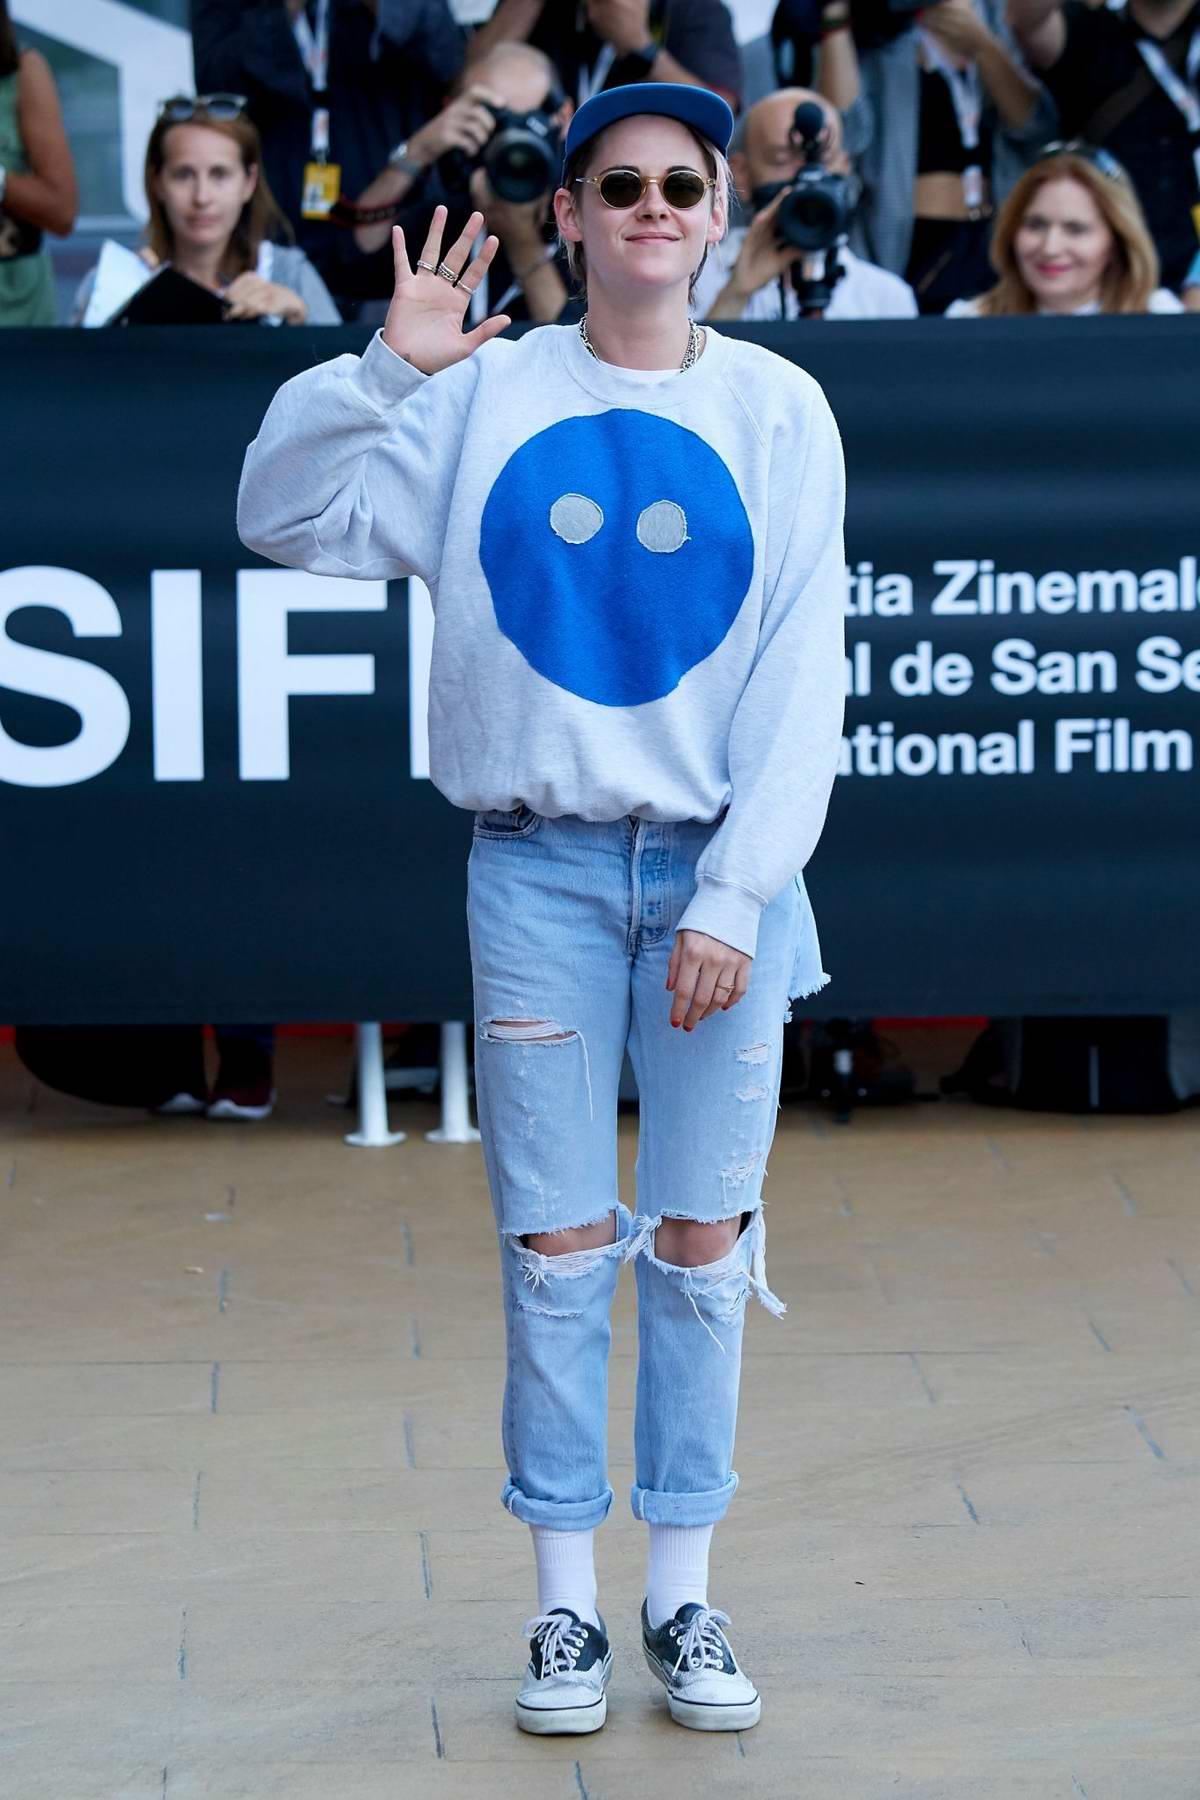 Kristen Stewart attends the 67th San Sebastian International Film Festival Previews in San Sebastian, Spain